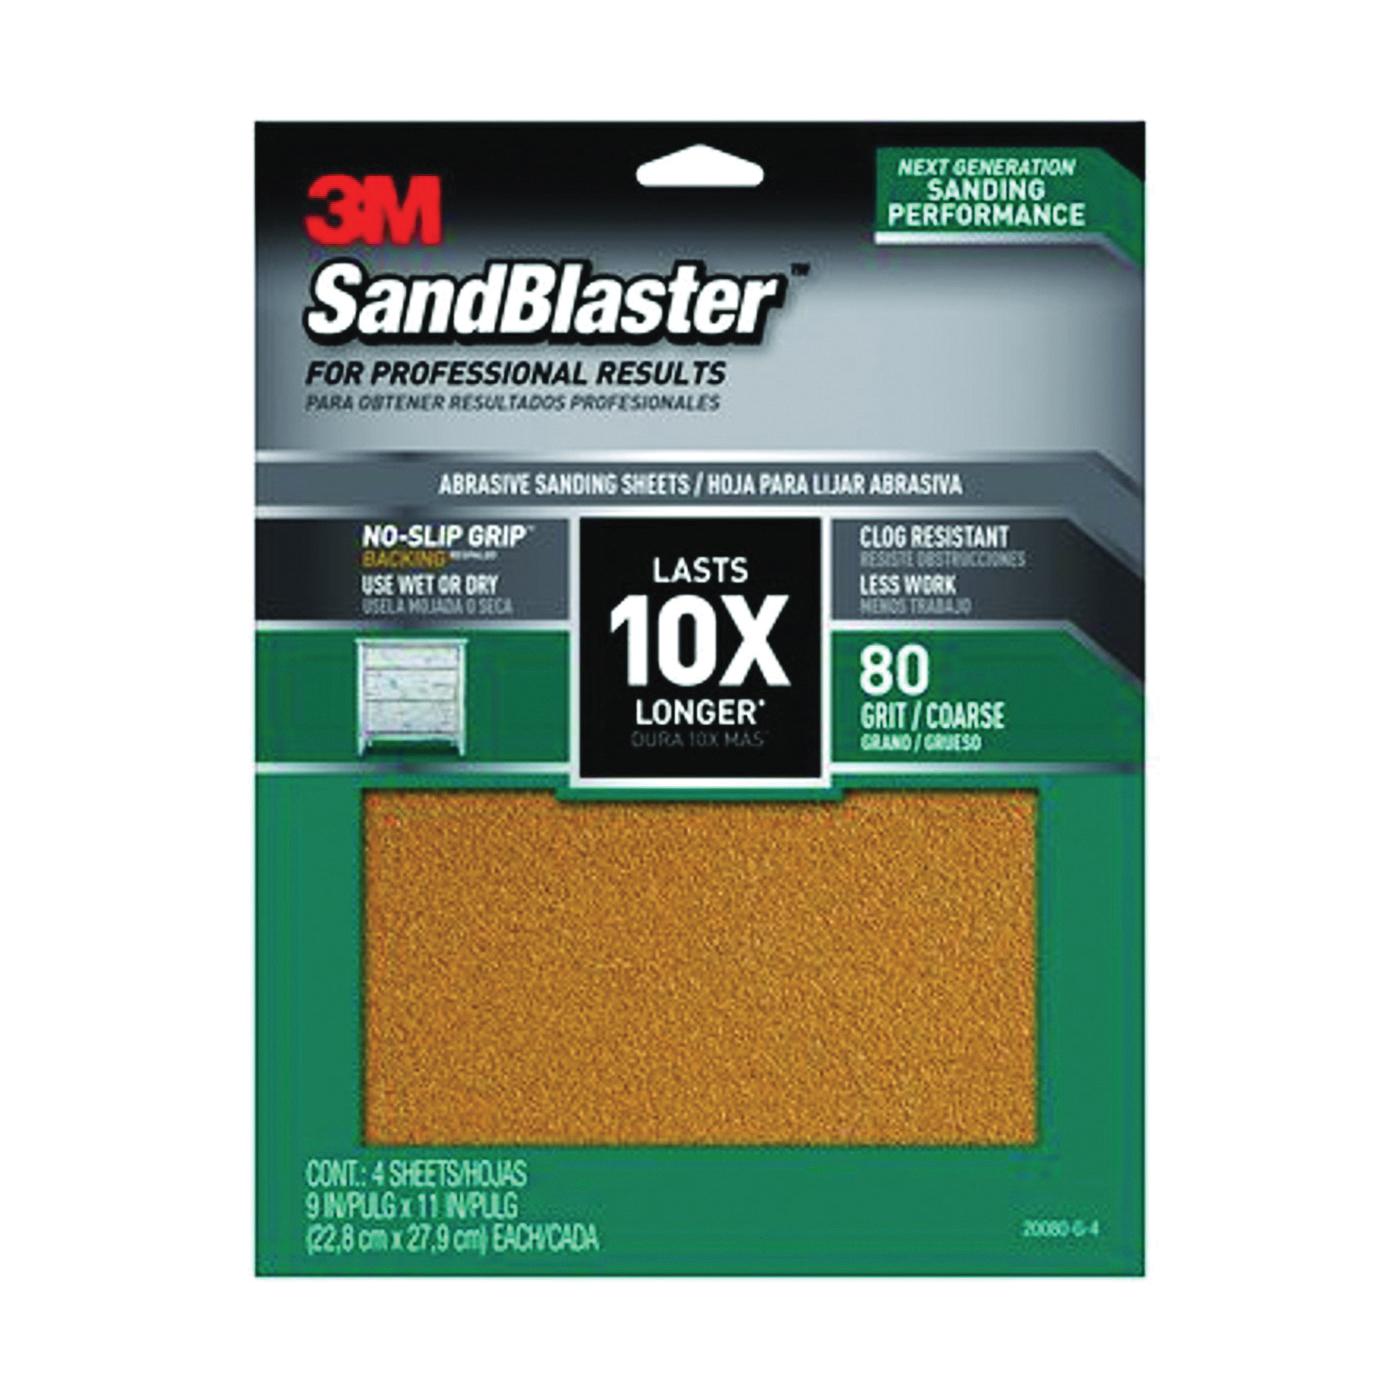 Picture of 3M SandBlaster 20080-G-4 Sandpaper, 11 in L, 9 in W, 80 Grit, Coarse, Aluminum Oxide Abrasive